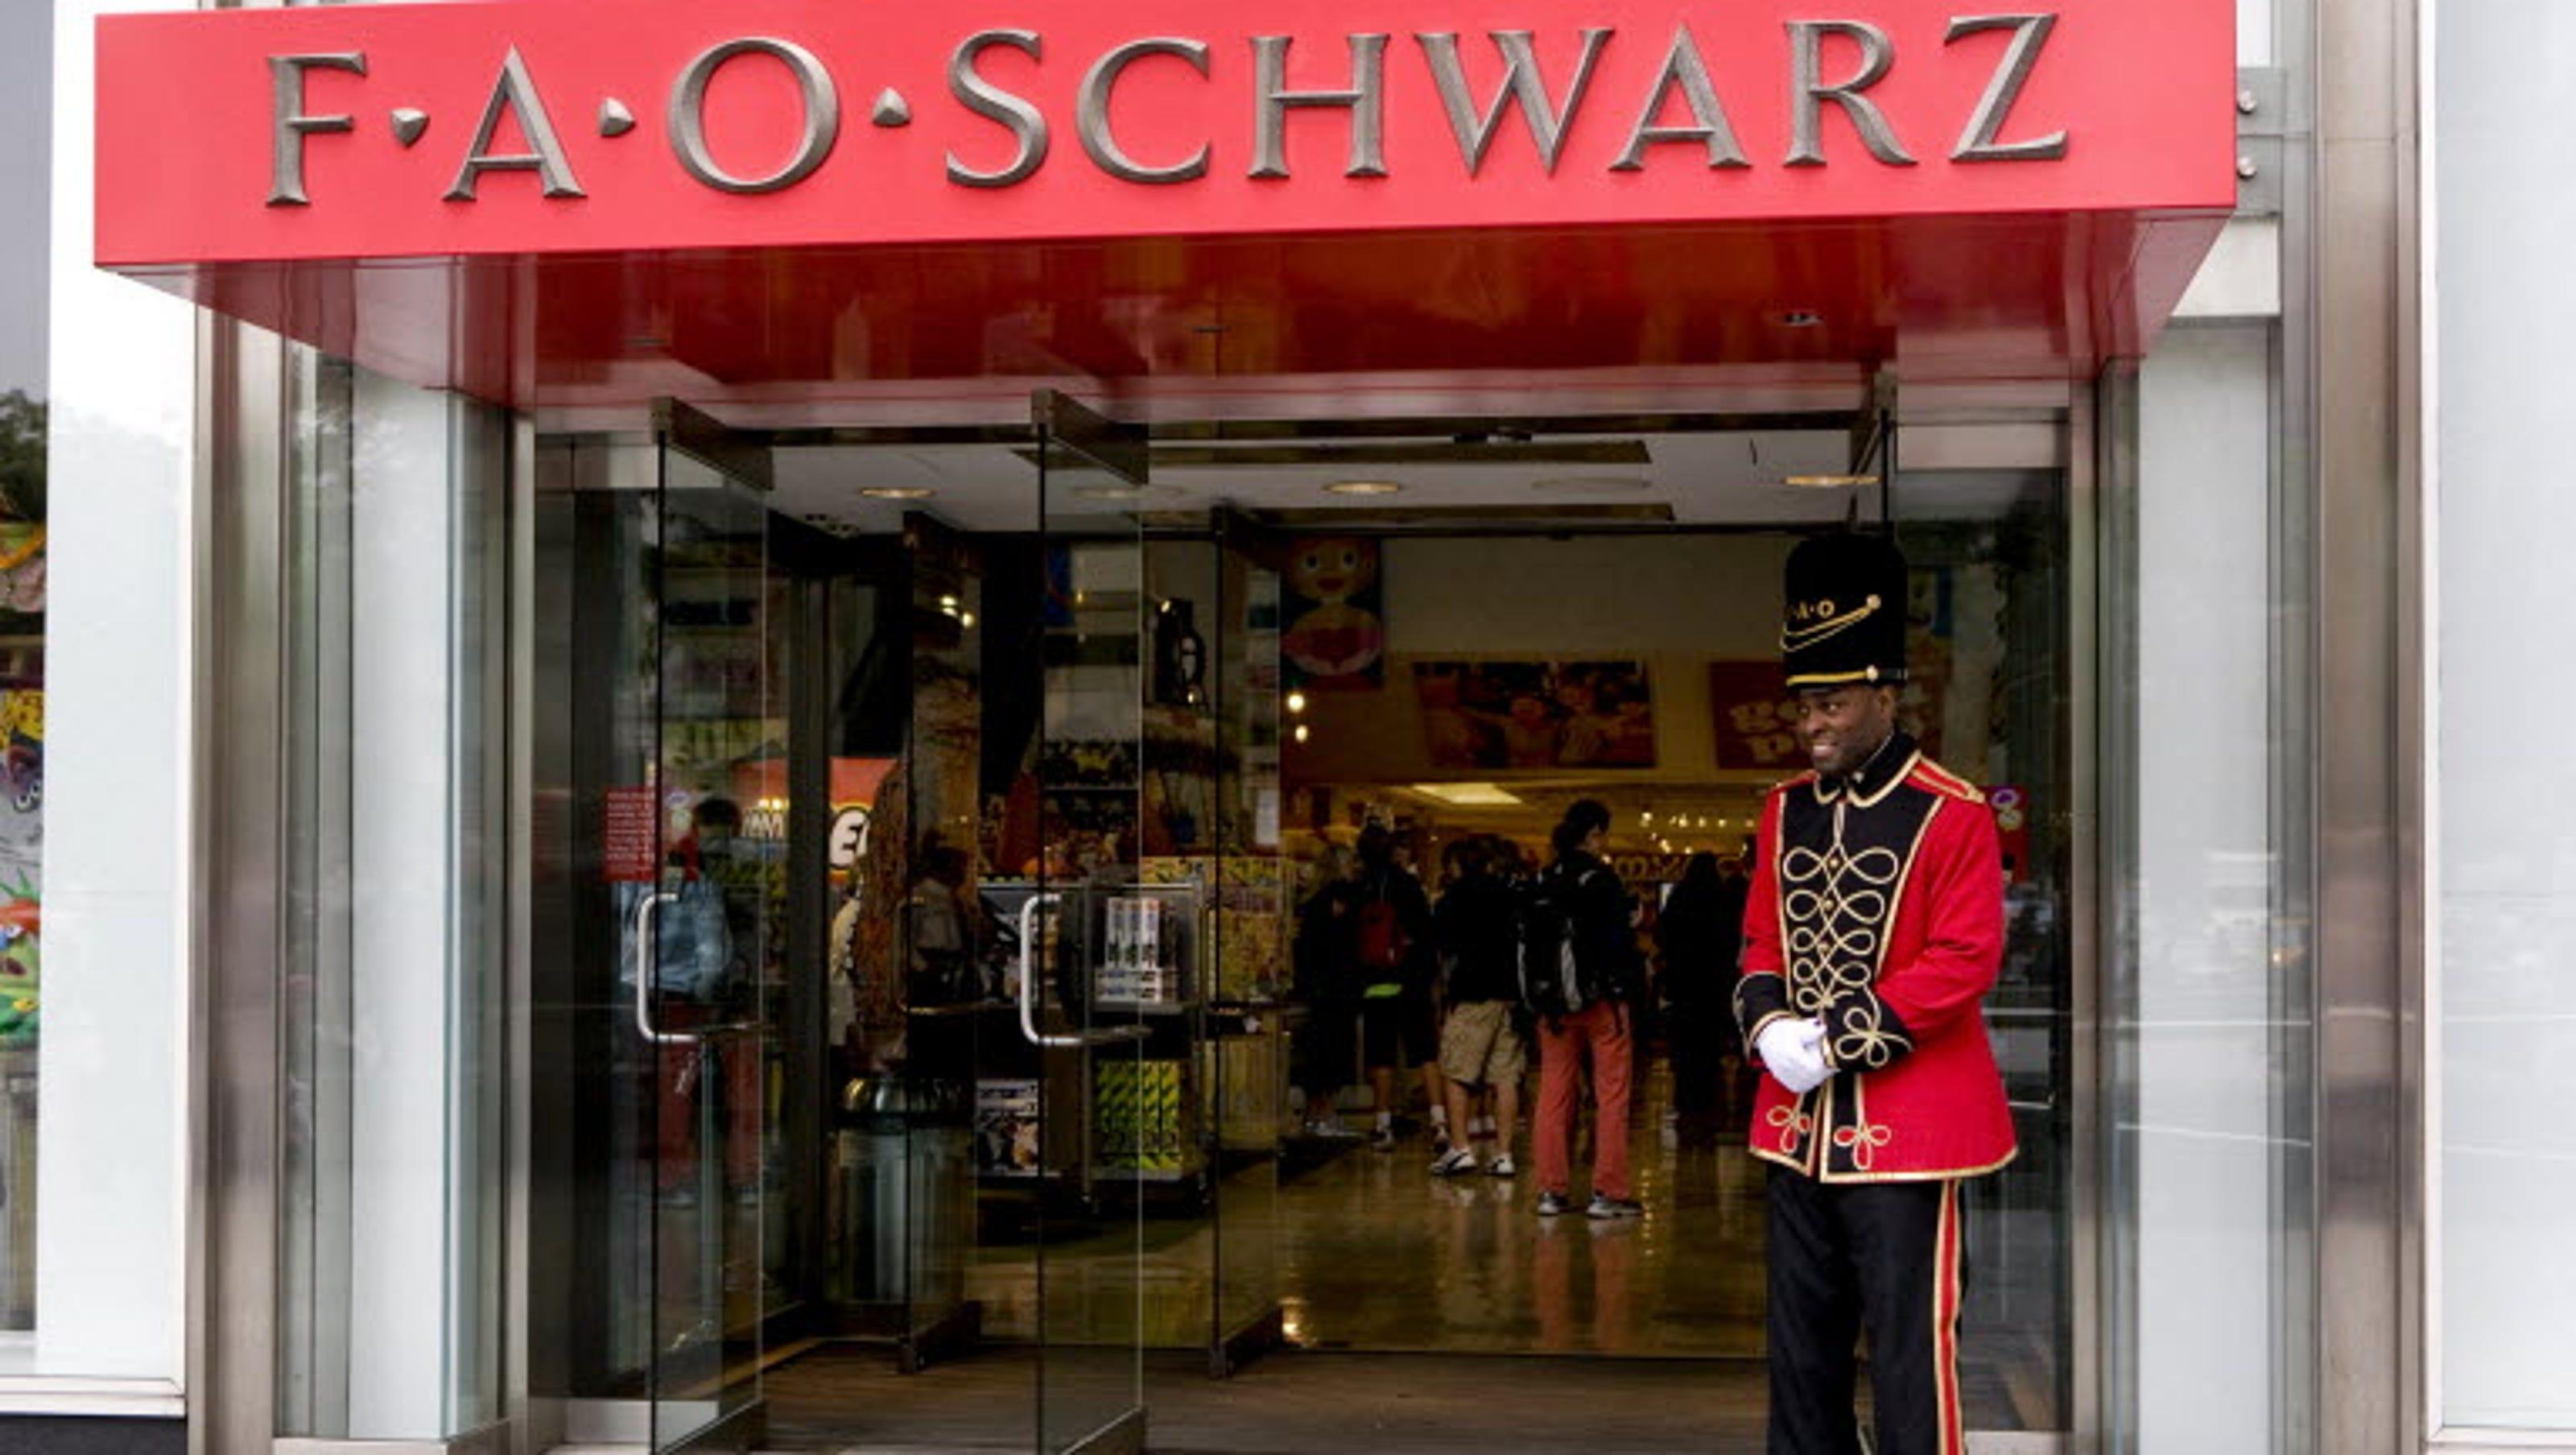 Fao Schwarz World Map.Fao Schwarz Toy Store In Nyc Closing July 15